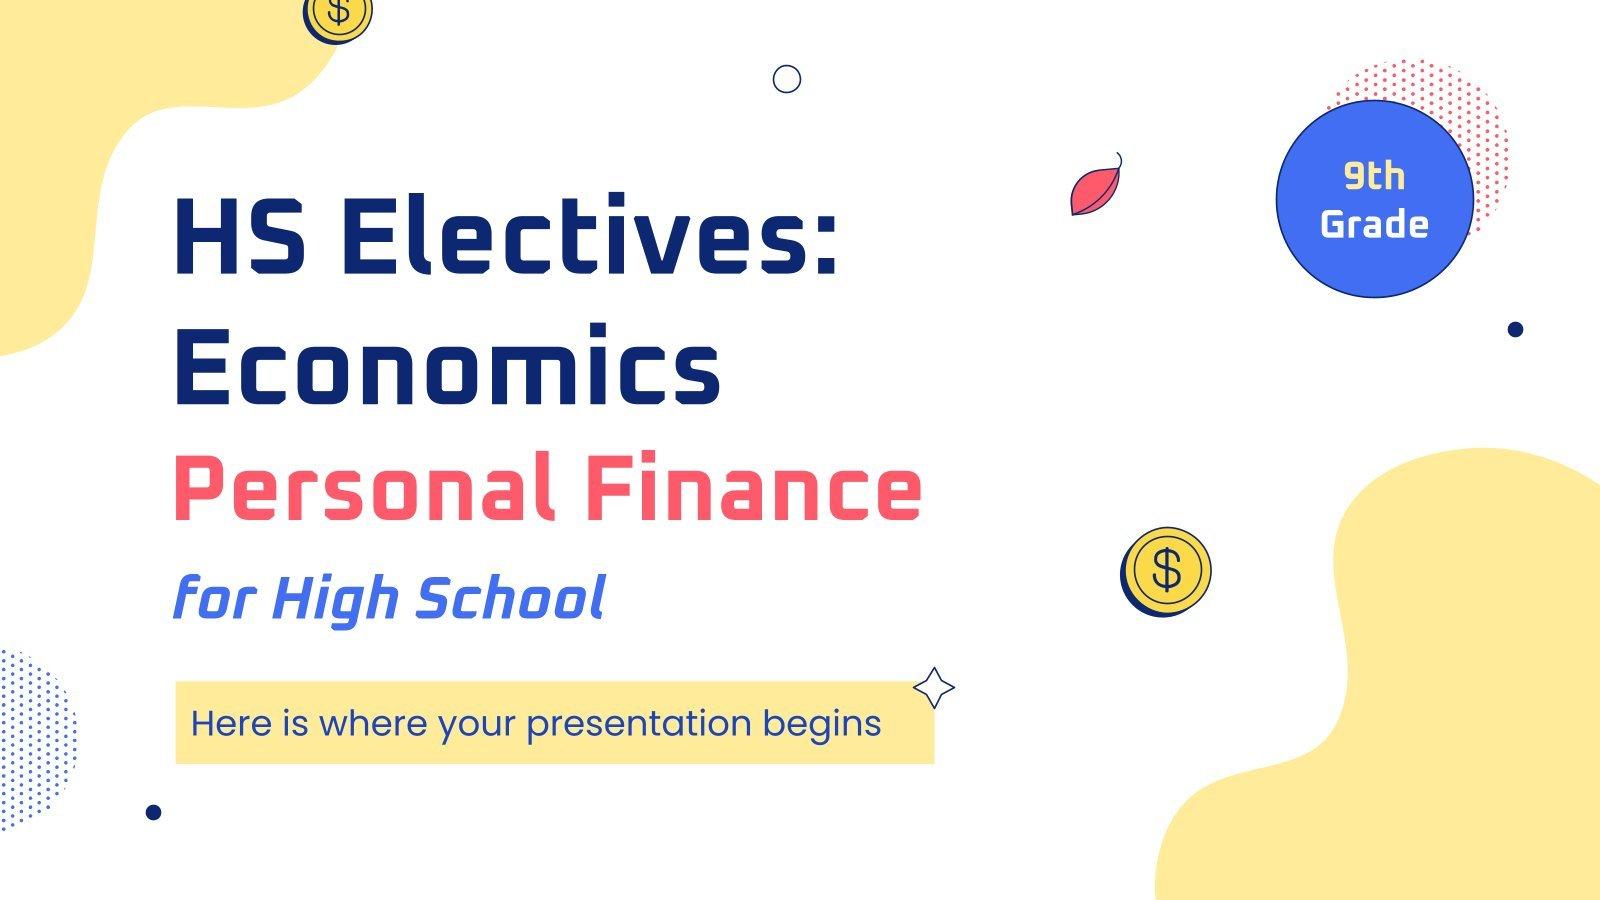 HS Electives Economics Subject - 9th Grade: Personal Finance presentation template